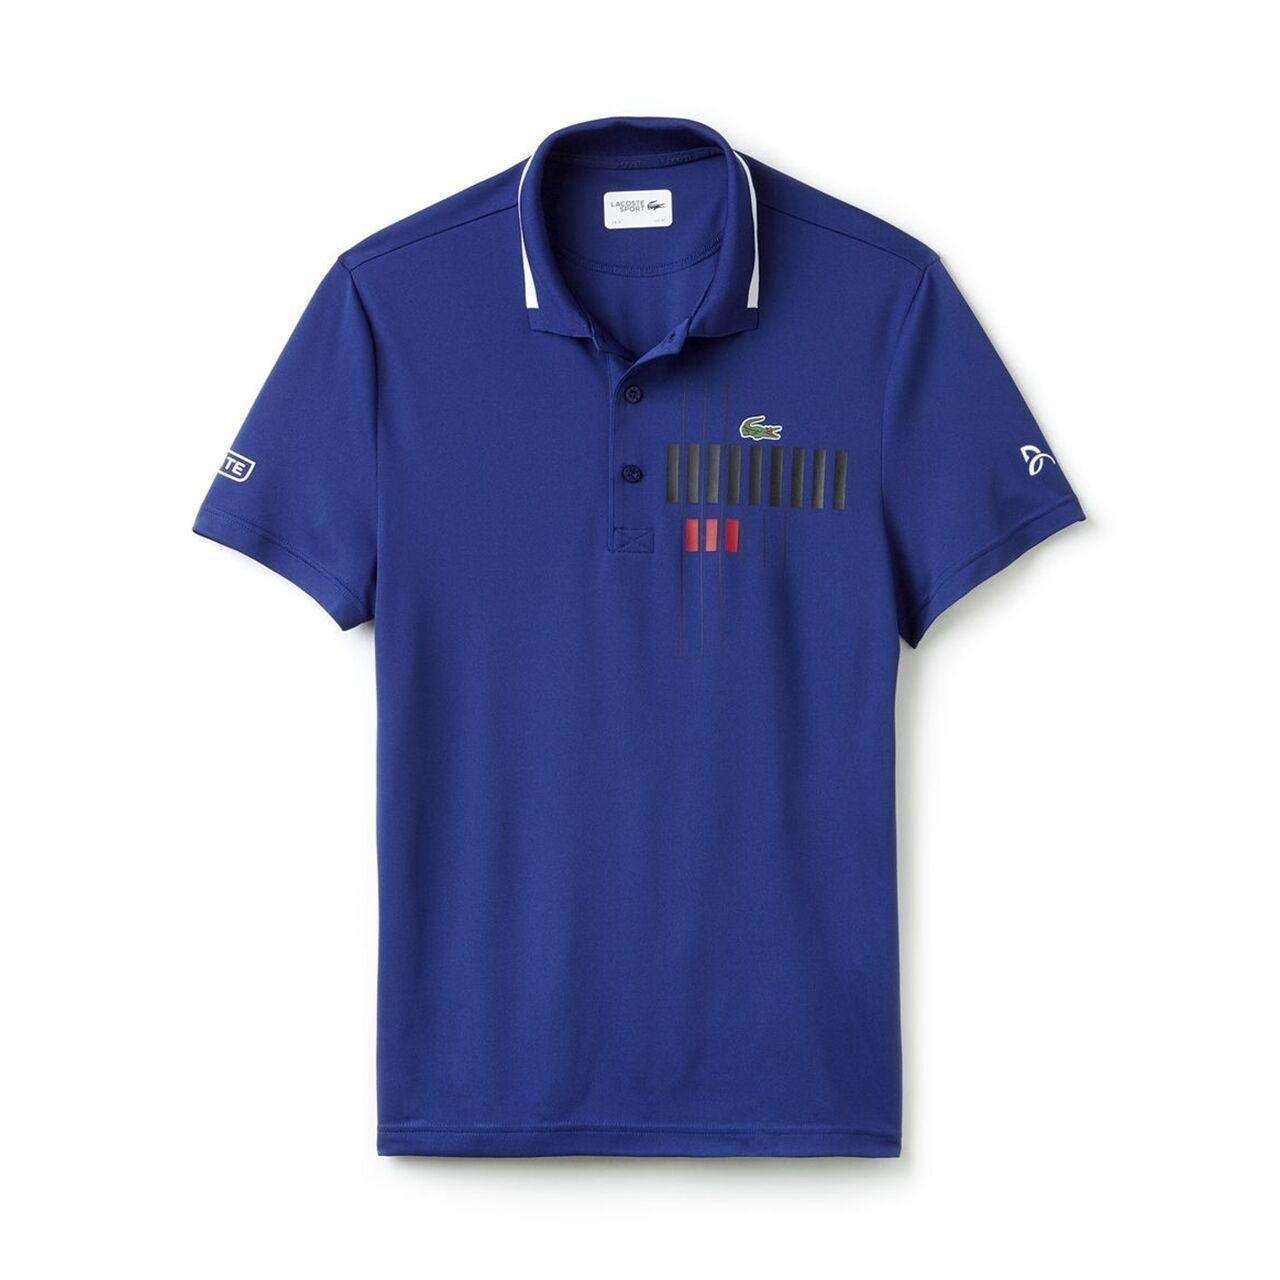 Lacoste Polo Novak Djokovic Collection Oceane/White Size XL S